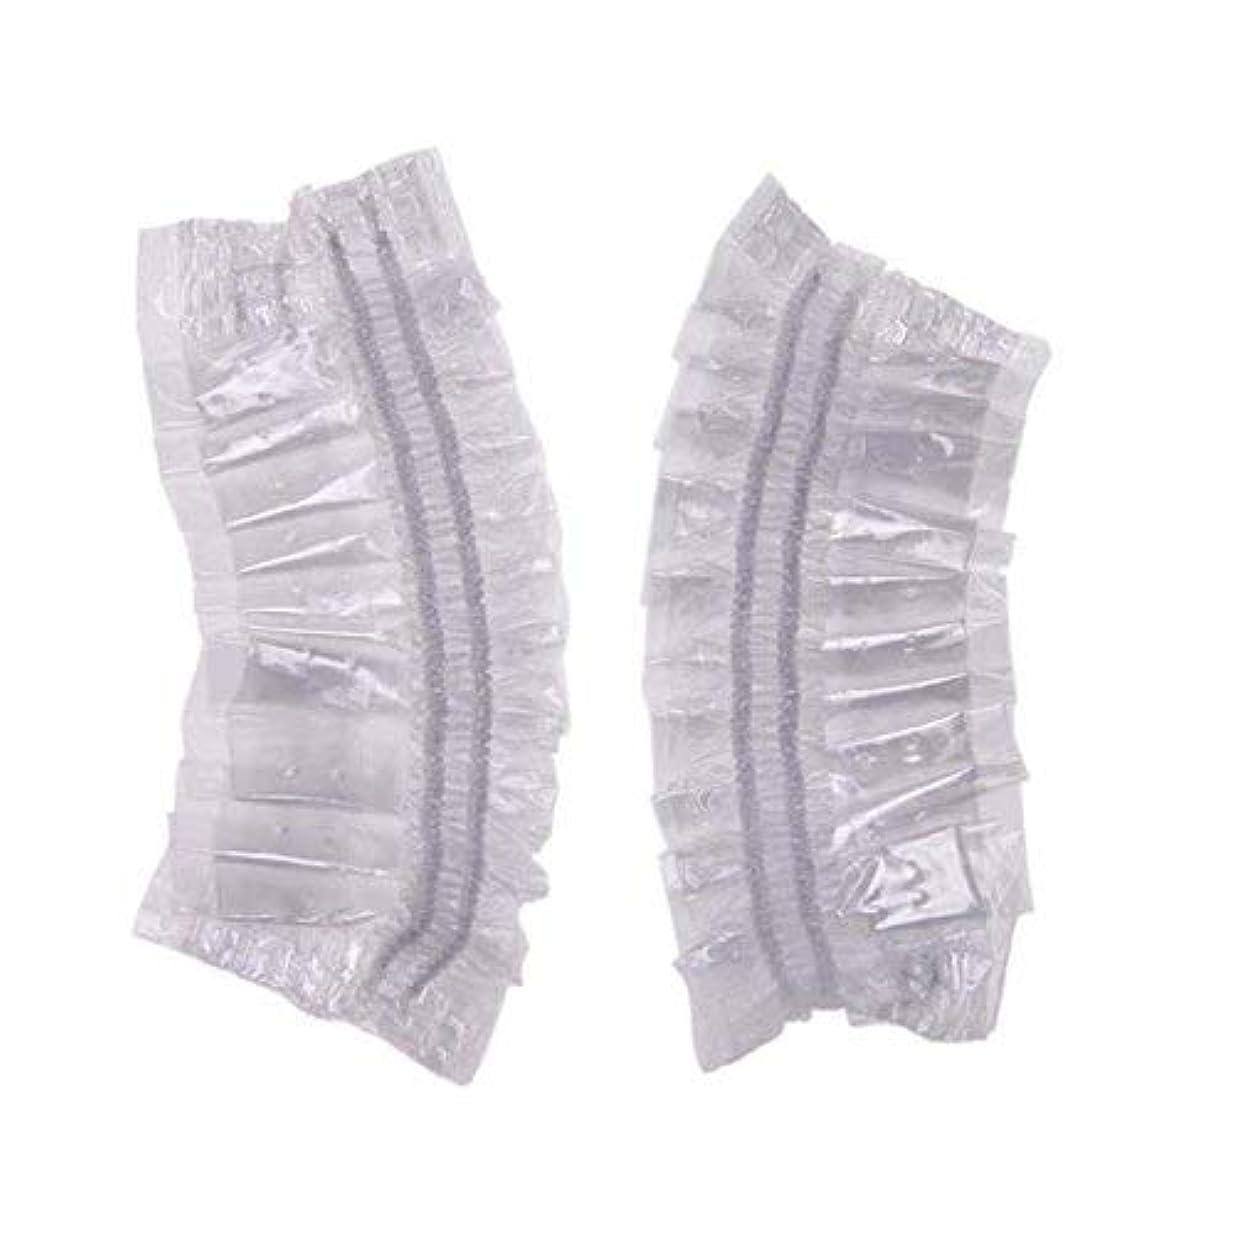 Lindexs イヤーキャップ 使い捨て 簡単 装着 透明 毛染め